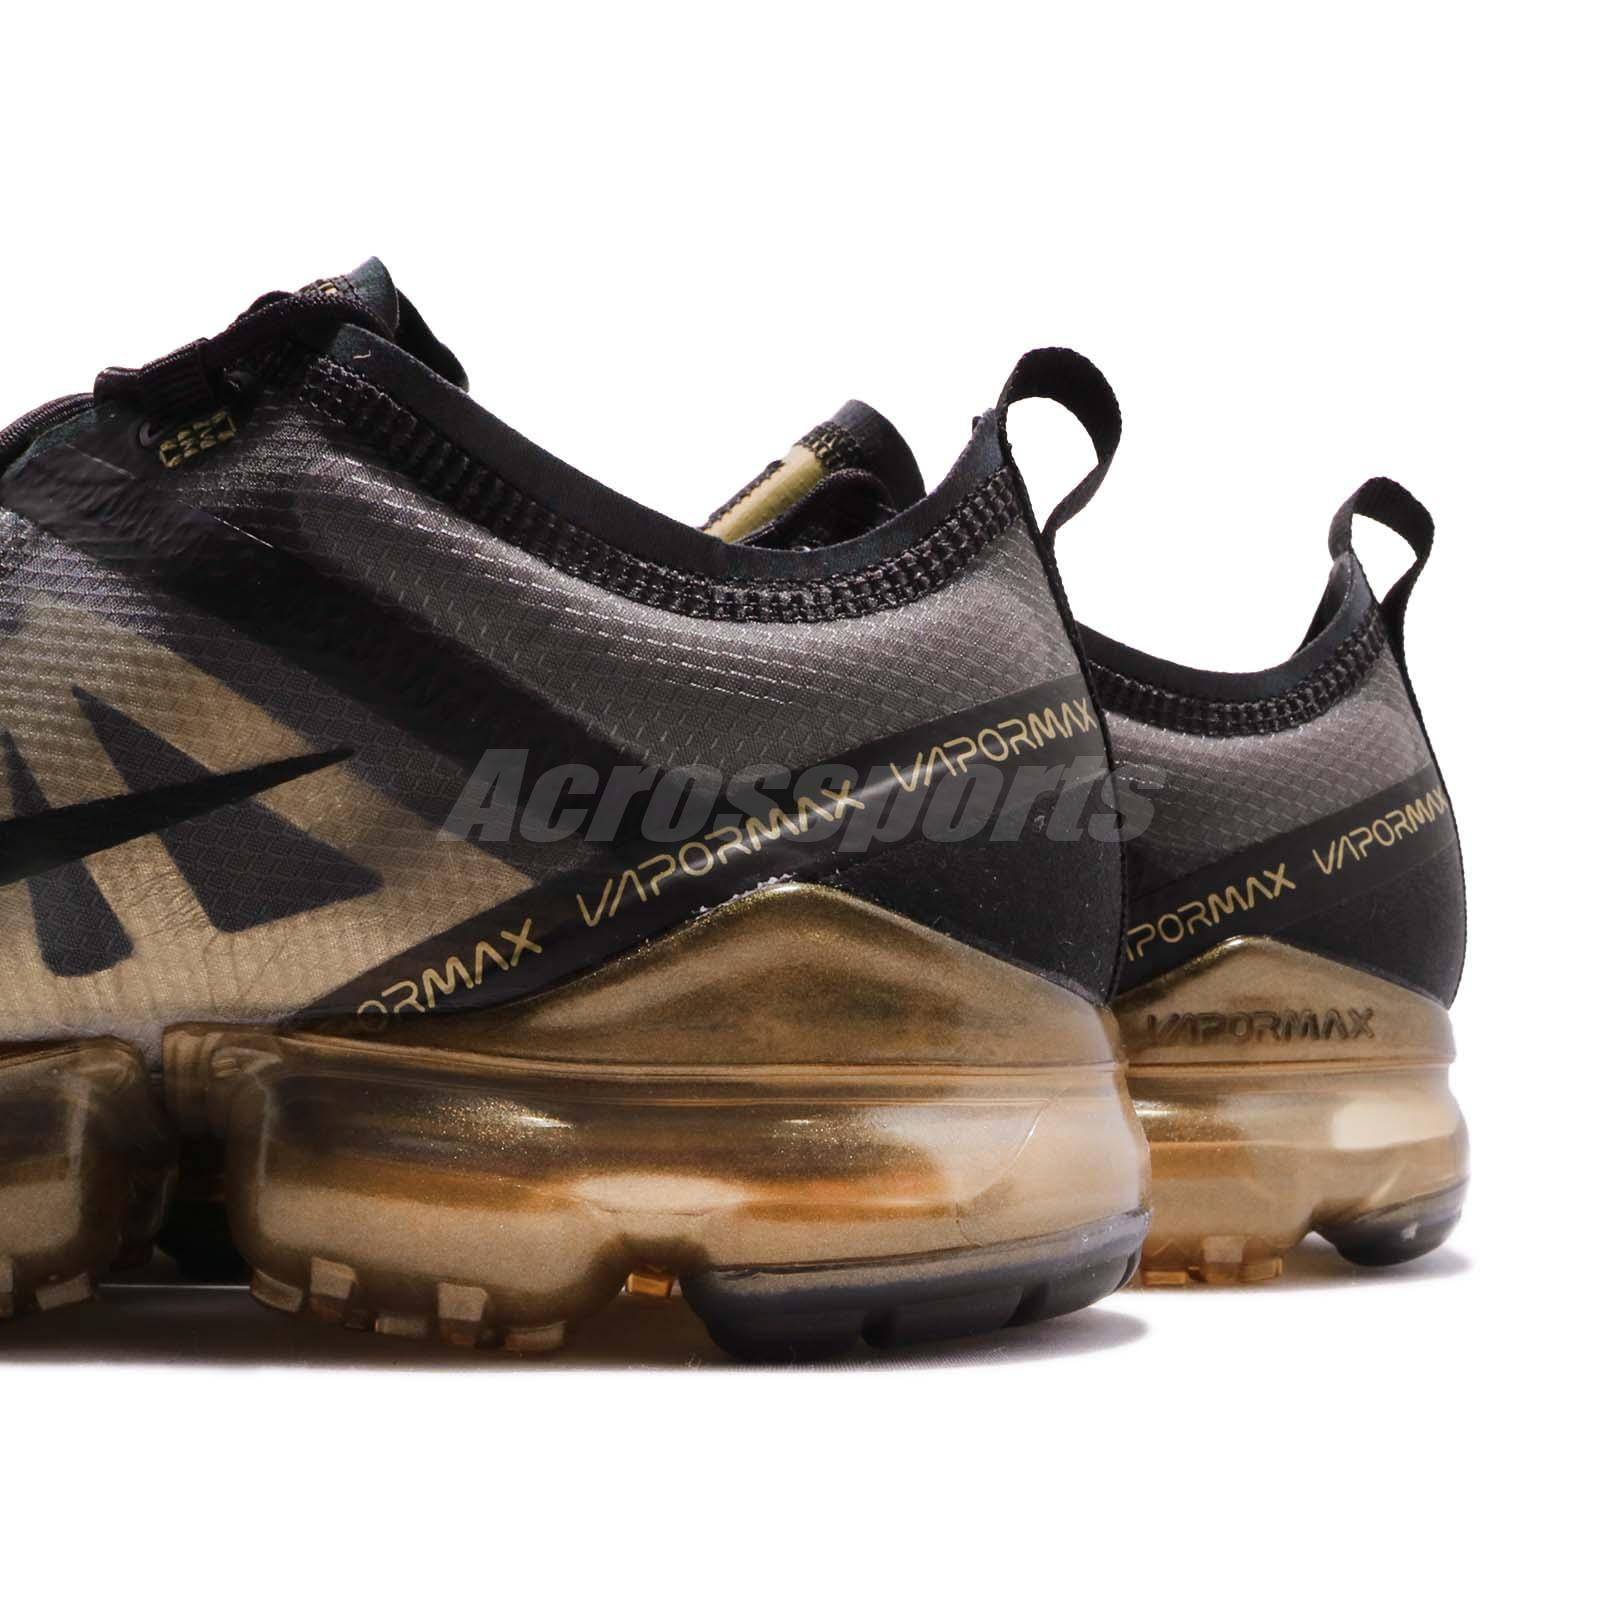 25cba188557 Nike Air Vapormax 2019 Black Gold Max Mens Running Shoes Sneakers ...